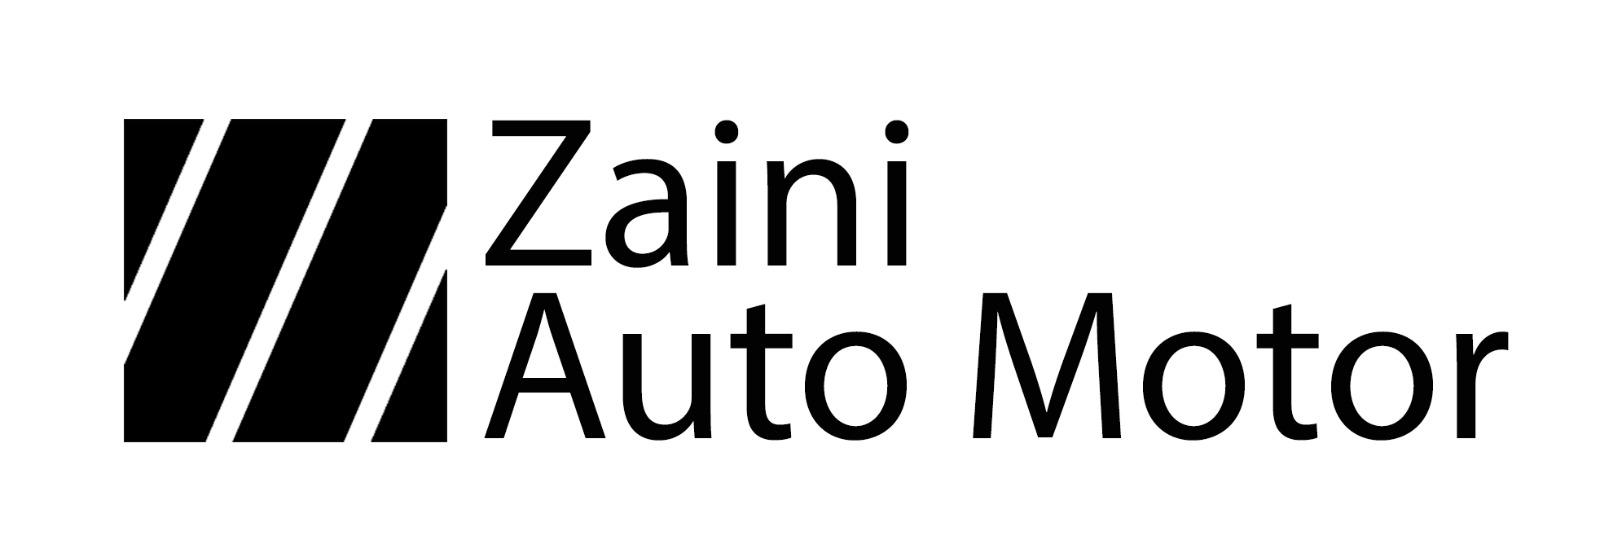 pt. zaini auto motor